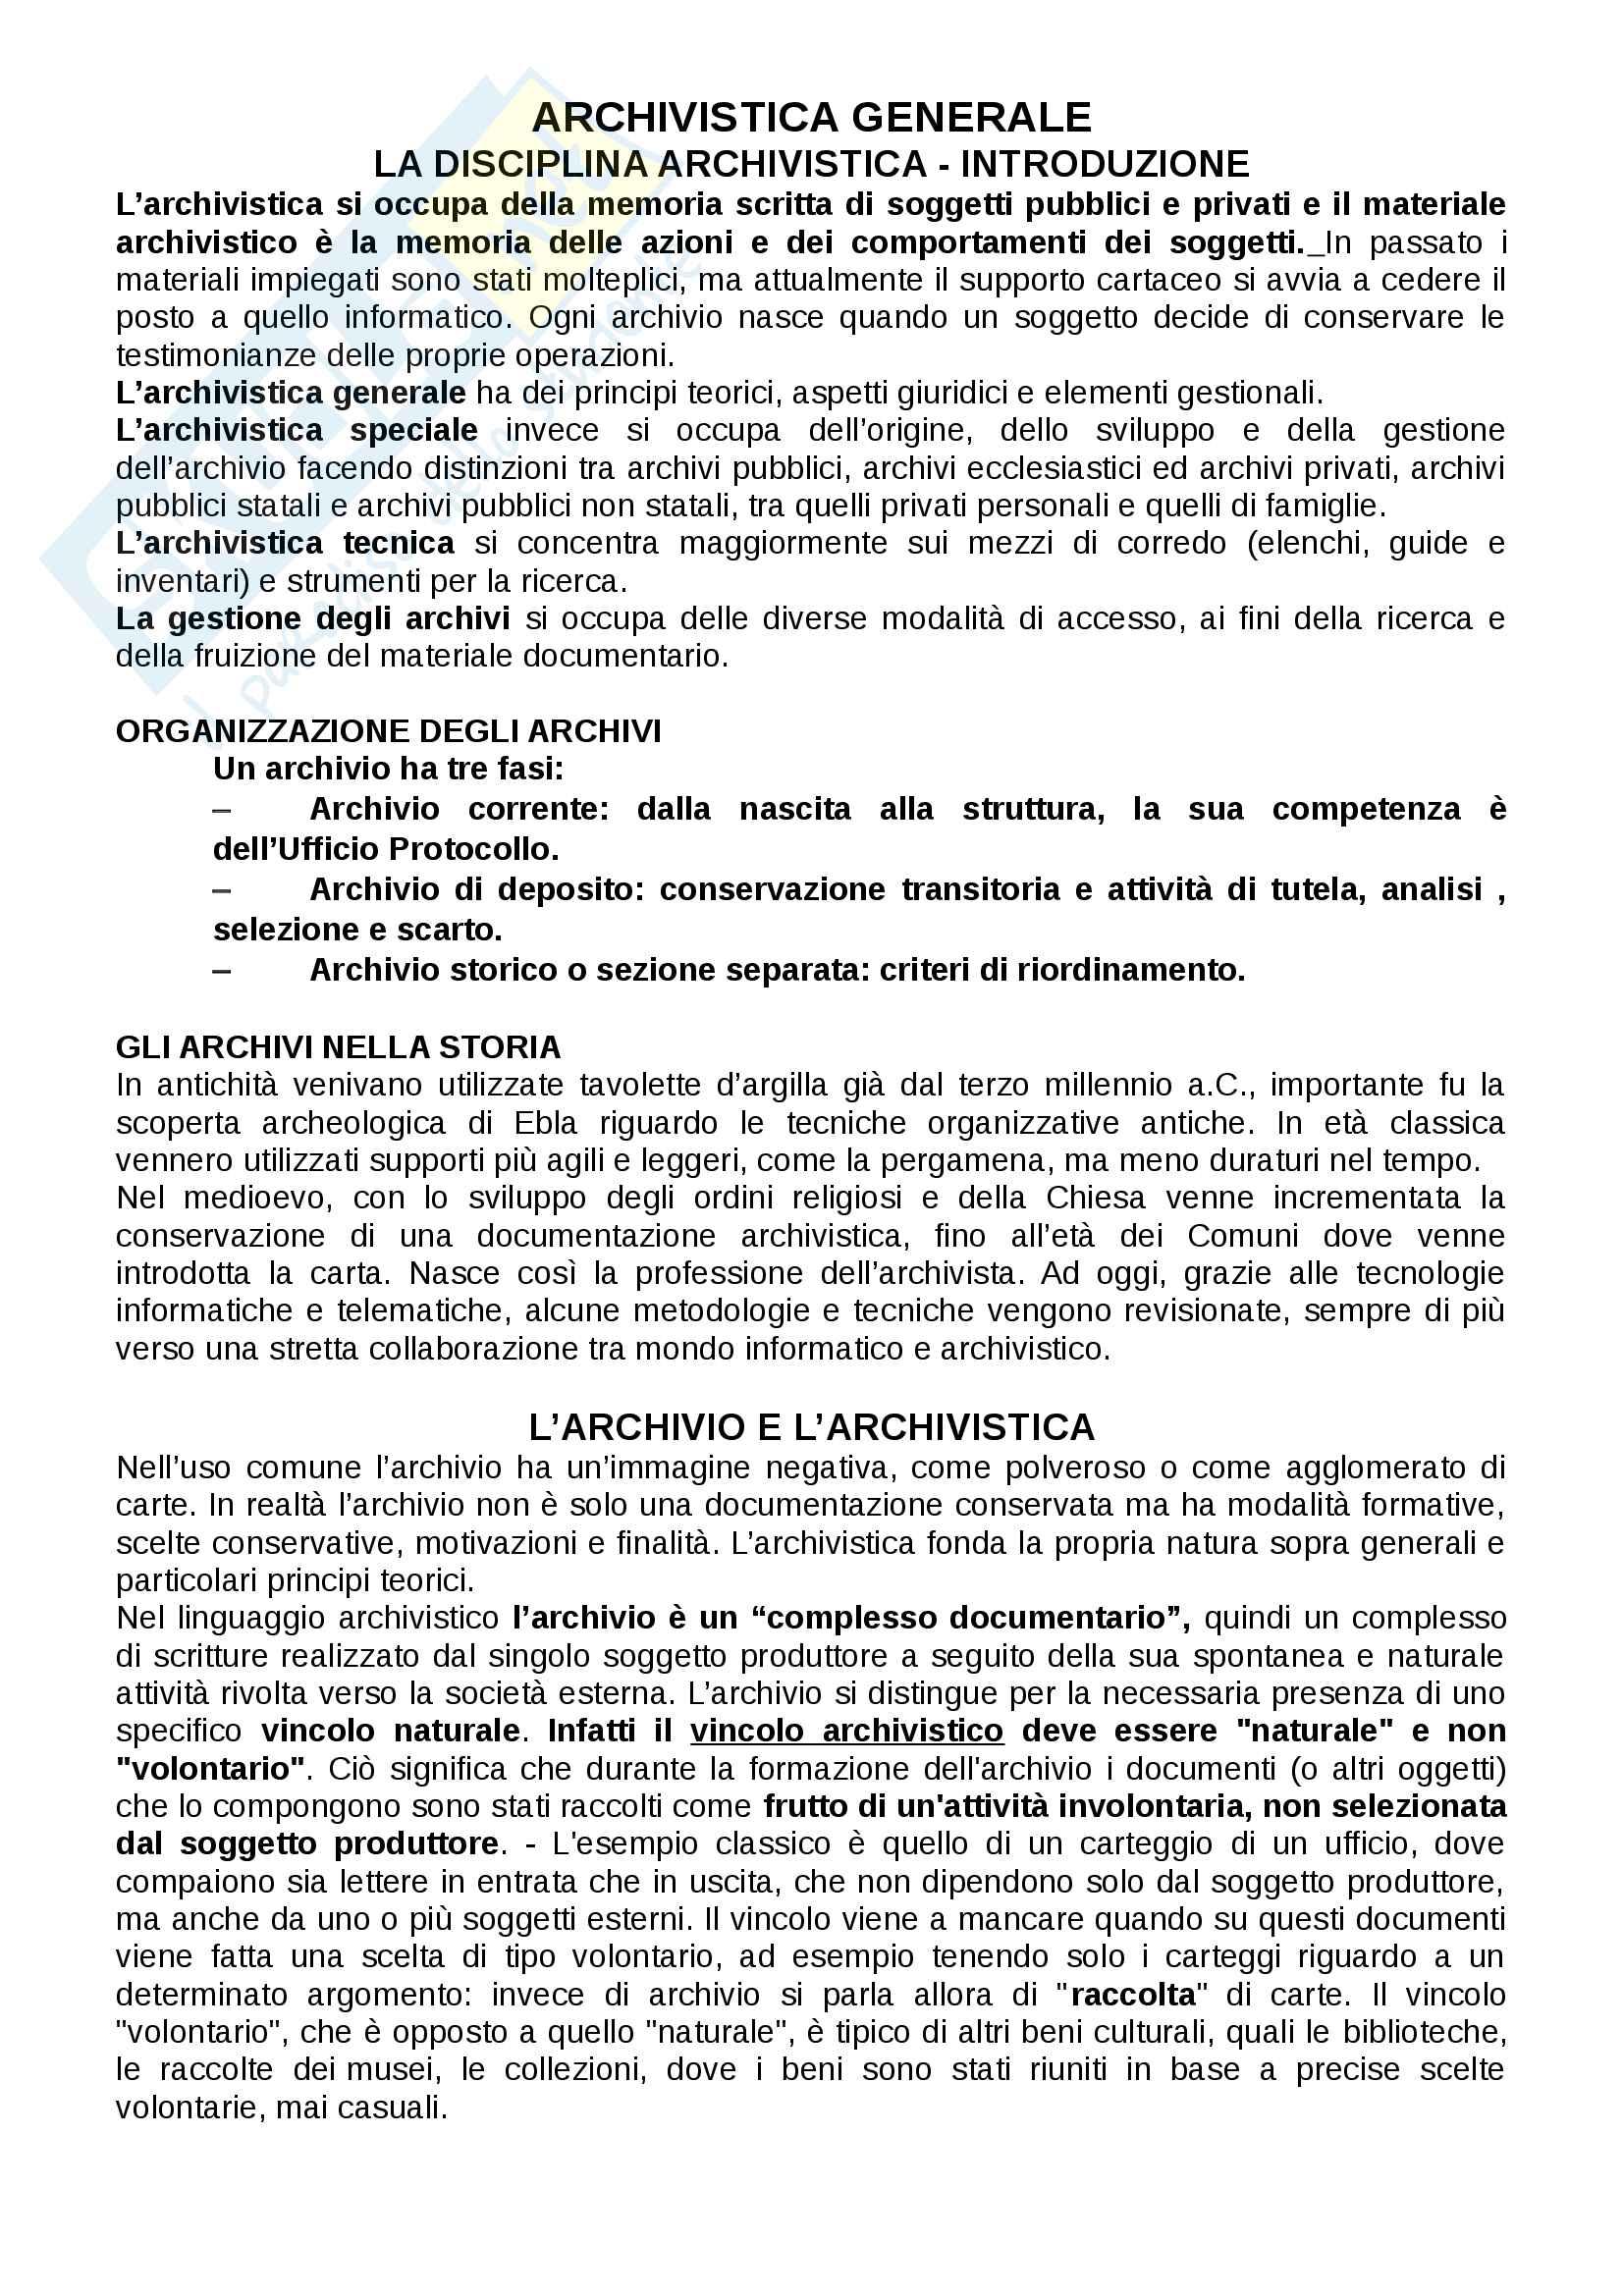 Riassunto esame Archivistica Generale , prof. Zaccaria R., libro consigliato Archivistica Generale, Romiti